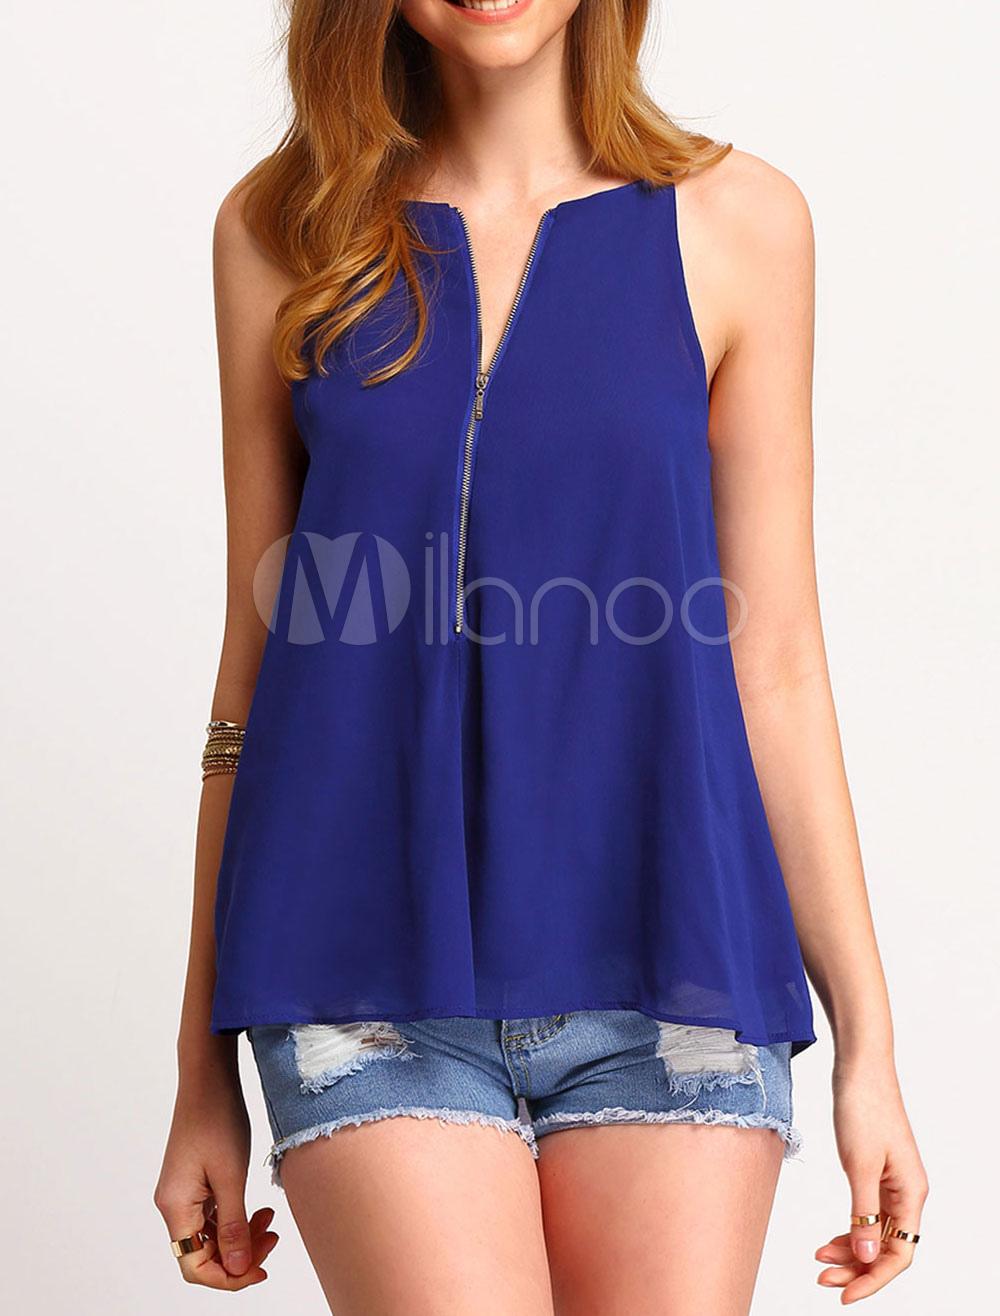 Women Chiffon Camis Front Zip Solid Color Summer Top